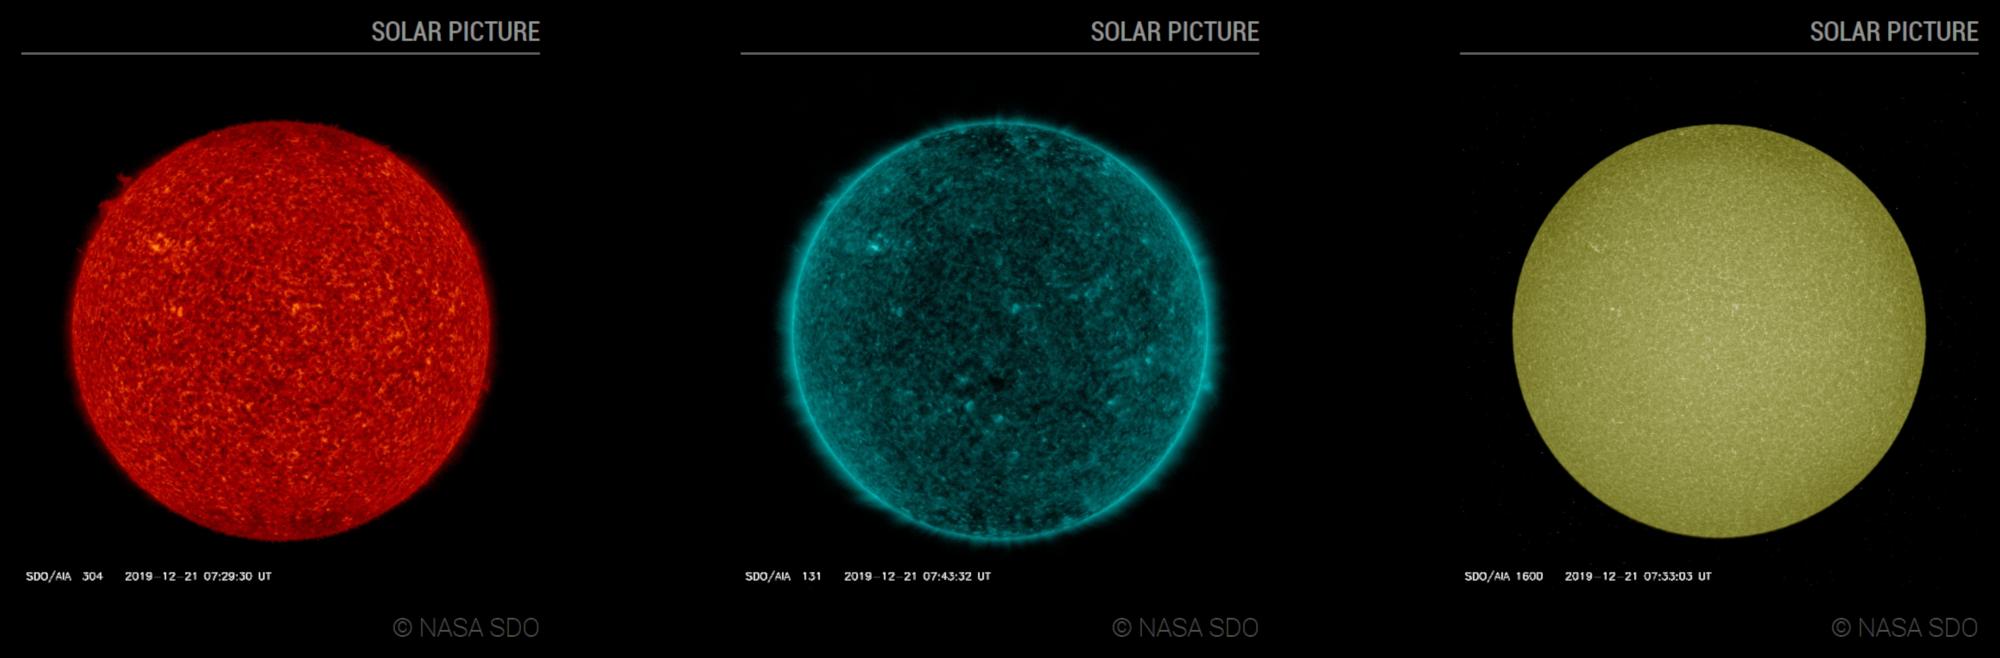 MMM-SolarPicture ScreenShots